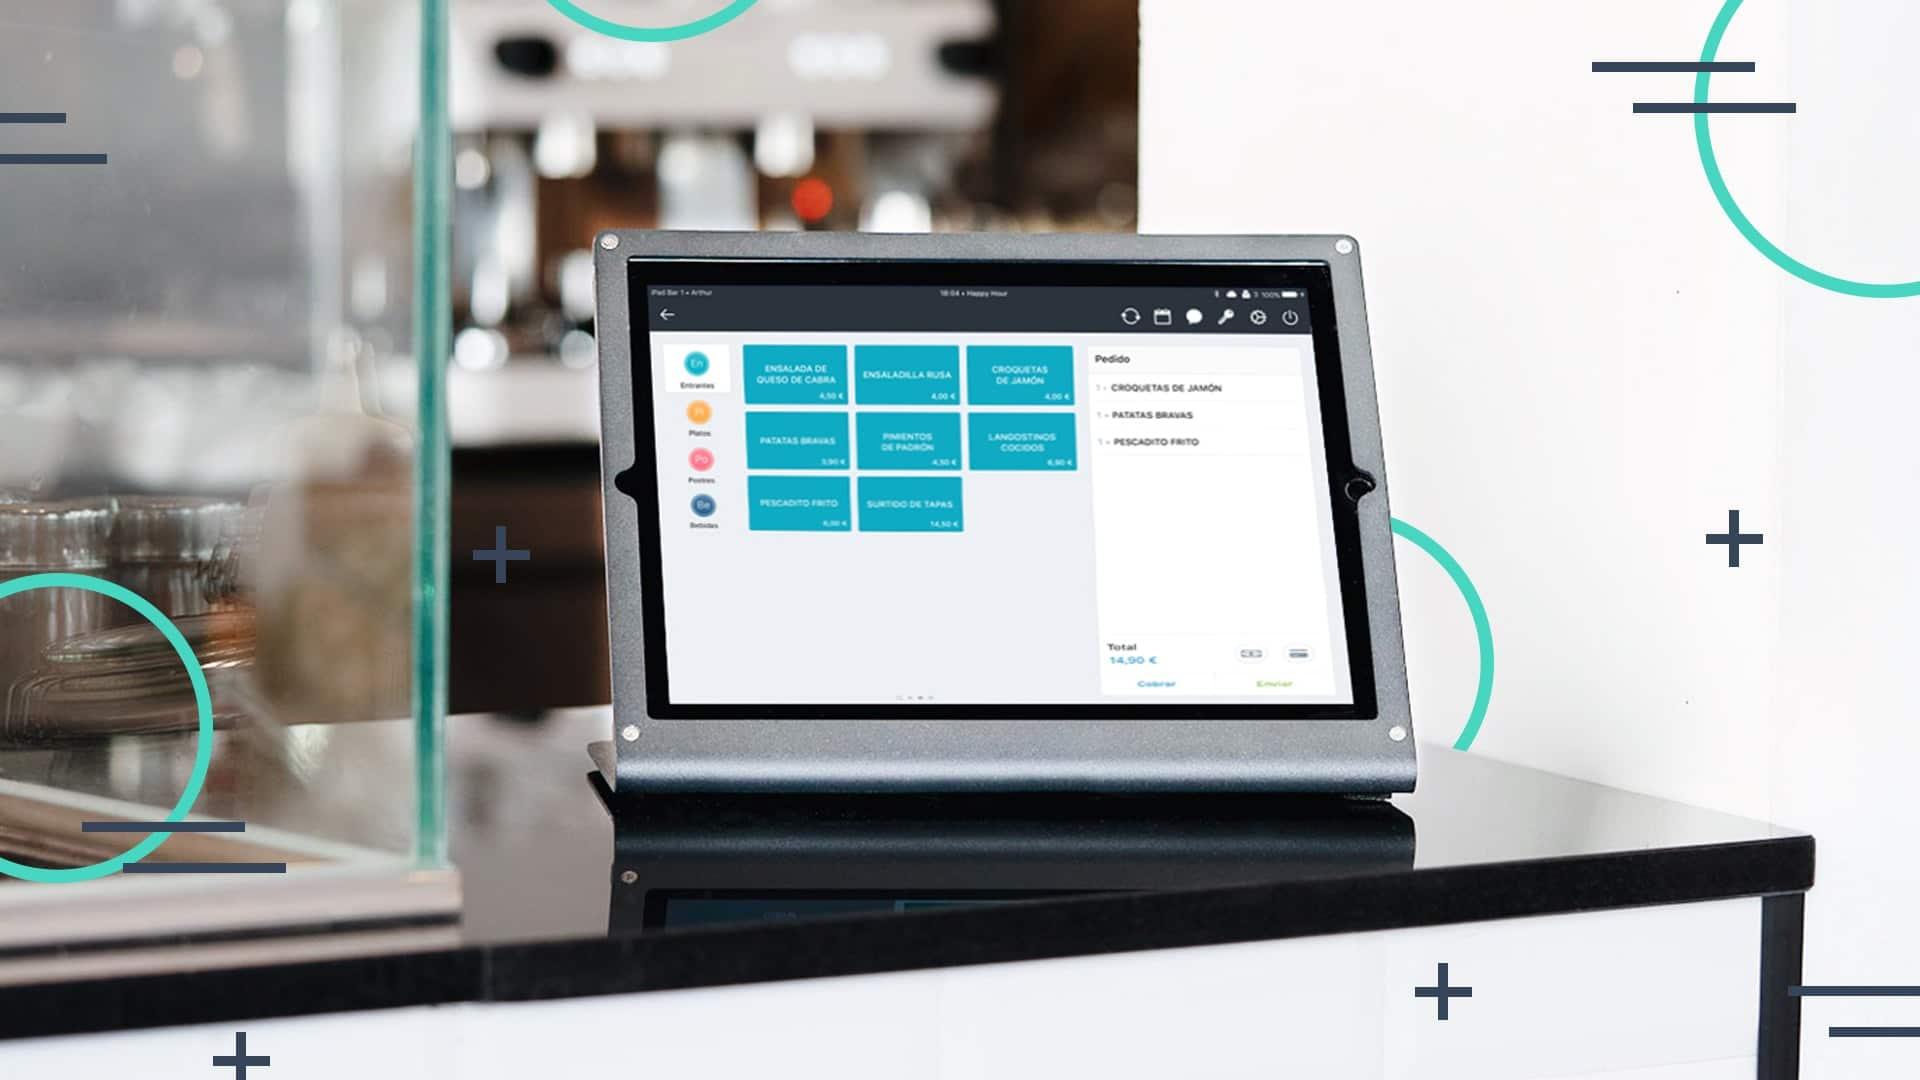 5-razones-para-elegir-el-sistema-de-TPV-Tiller-display-1-1